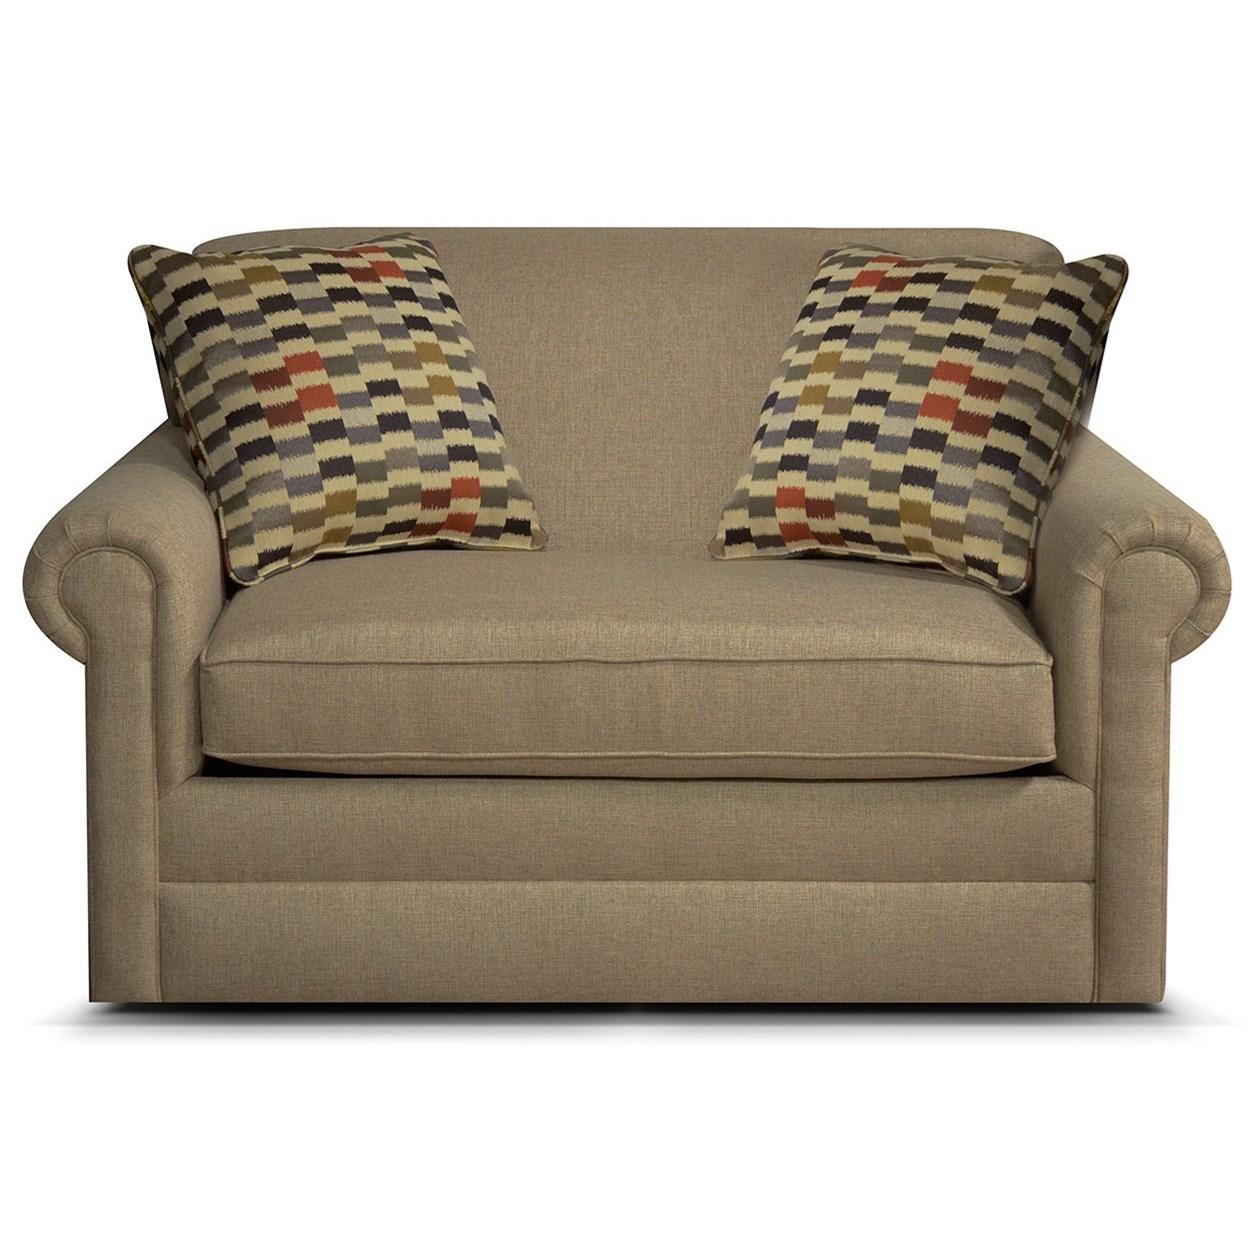 england savona twin sleeper sofa lindy 39 s furniture company sleeper sofas. Black Bedroom Furniture Sets. Home Design Ideas